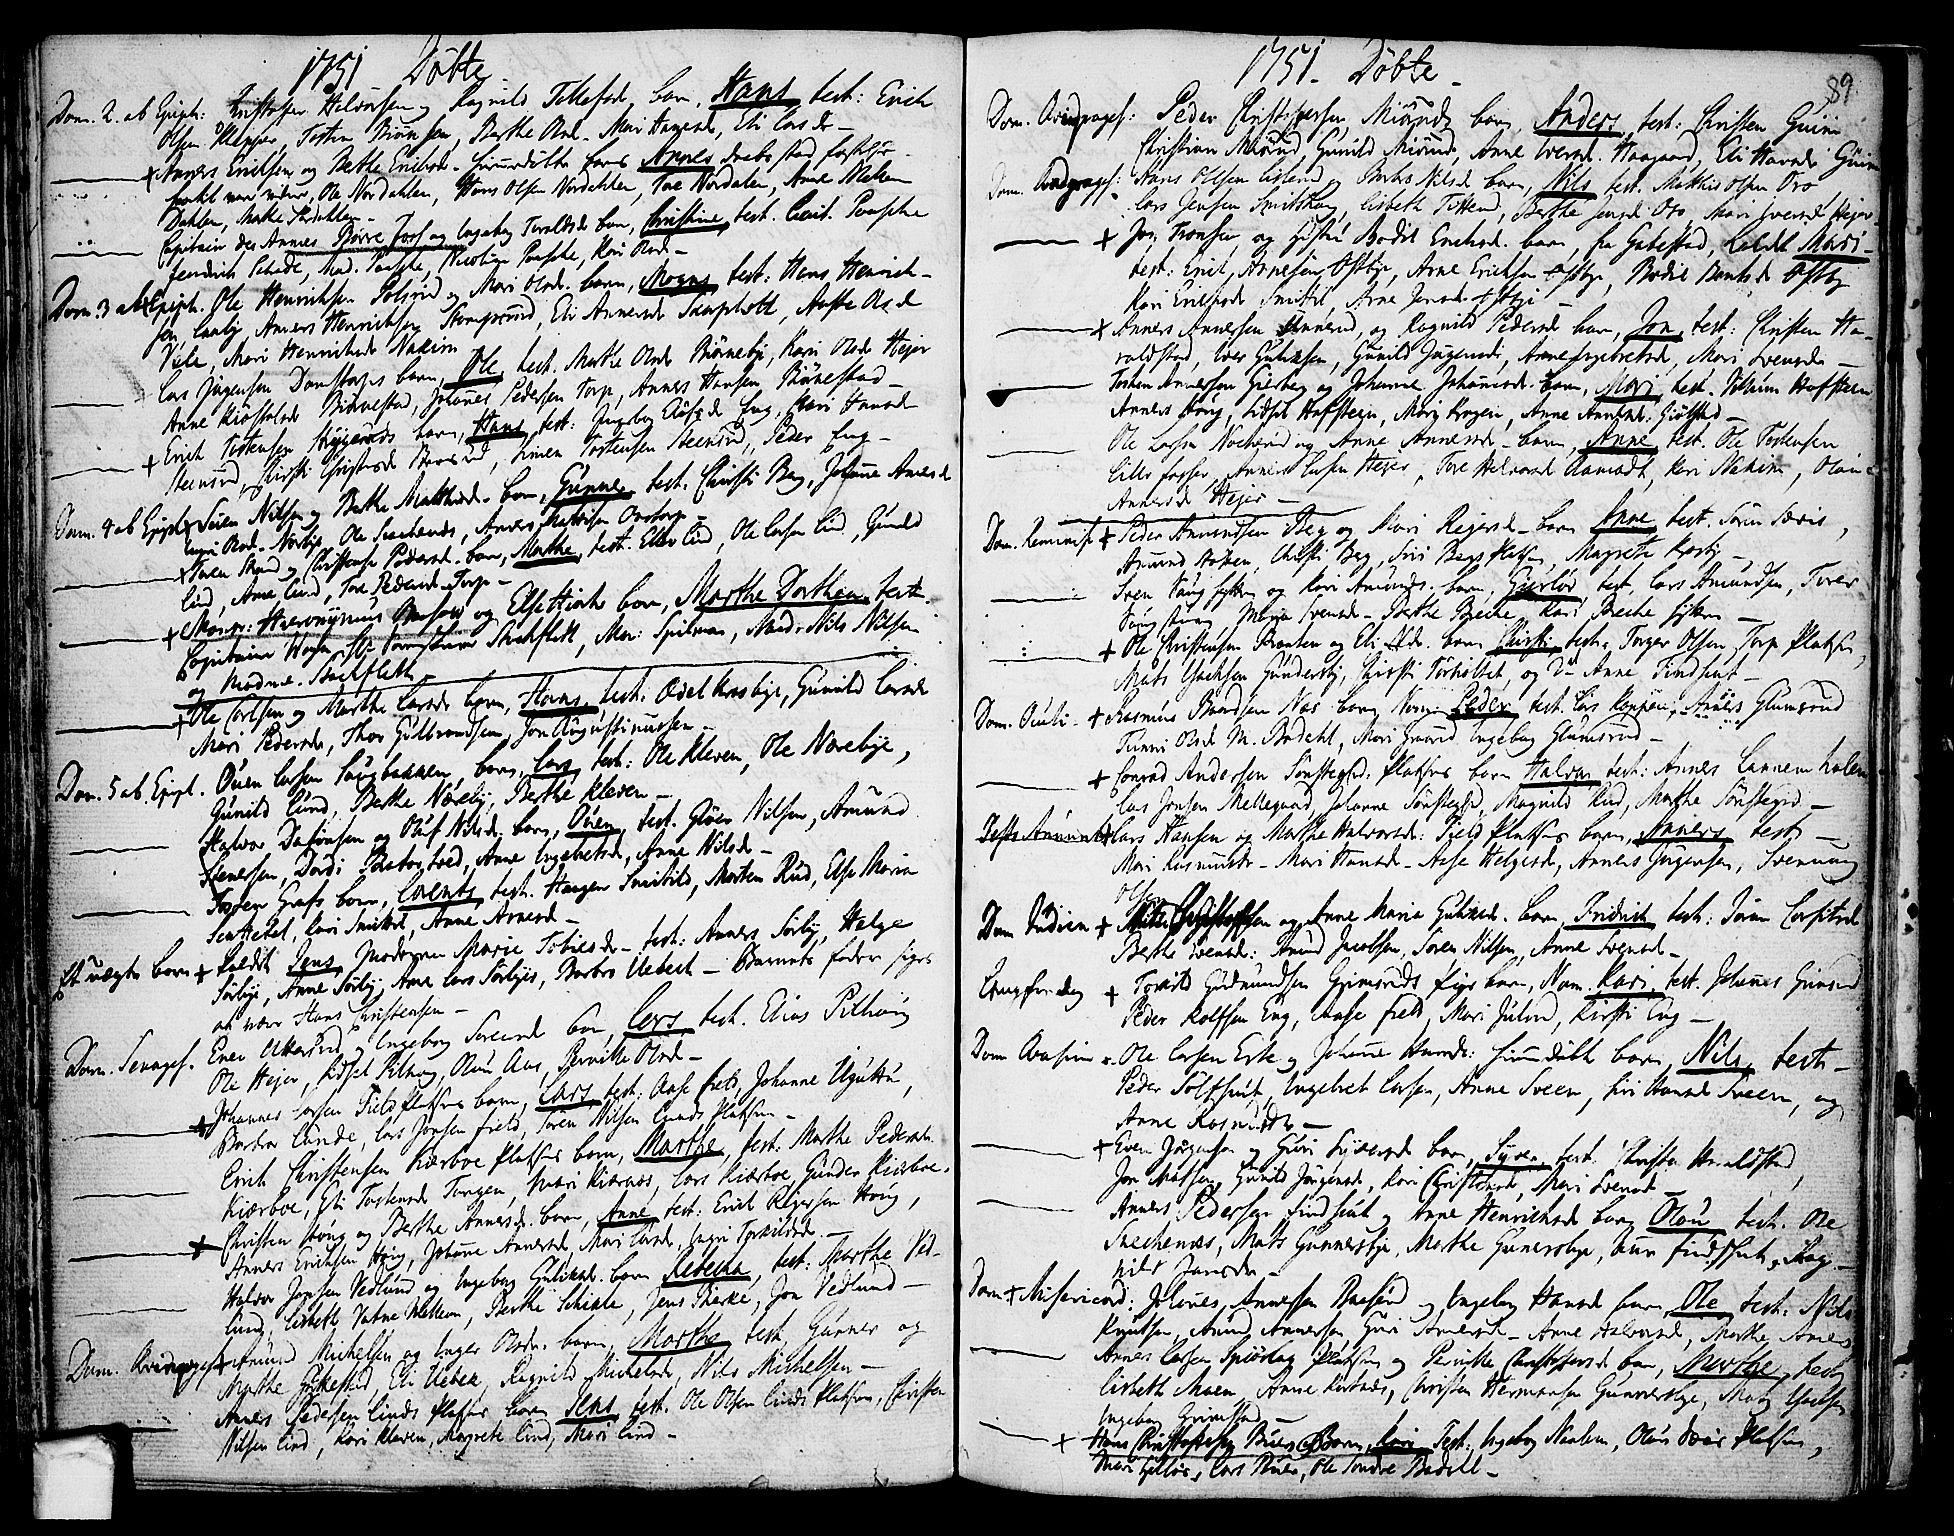 SAO, Rakkestad prestekontor Kirkebøker, F/Fa/L0002: Ministerialbok nr. I 2, 1741-1751, s. 89